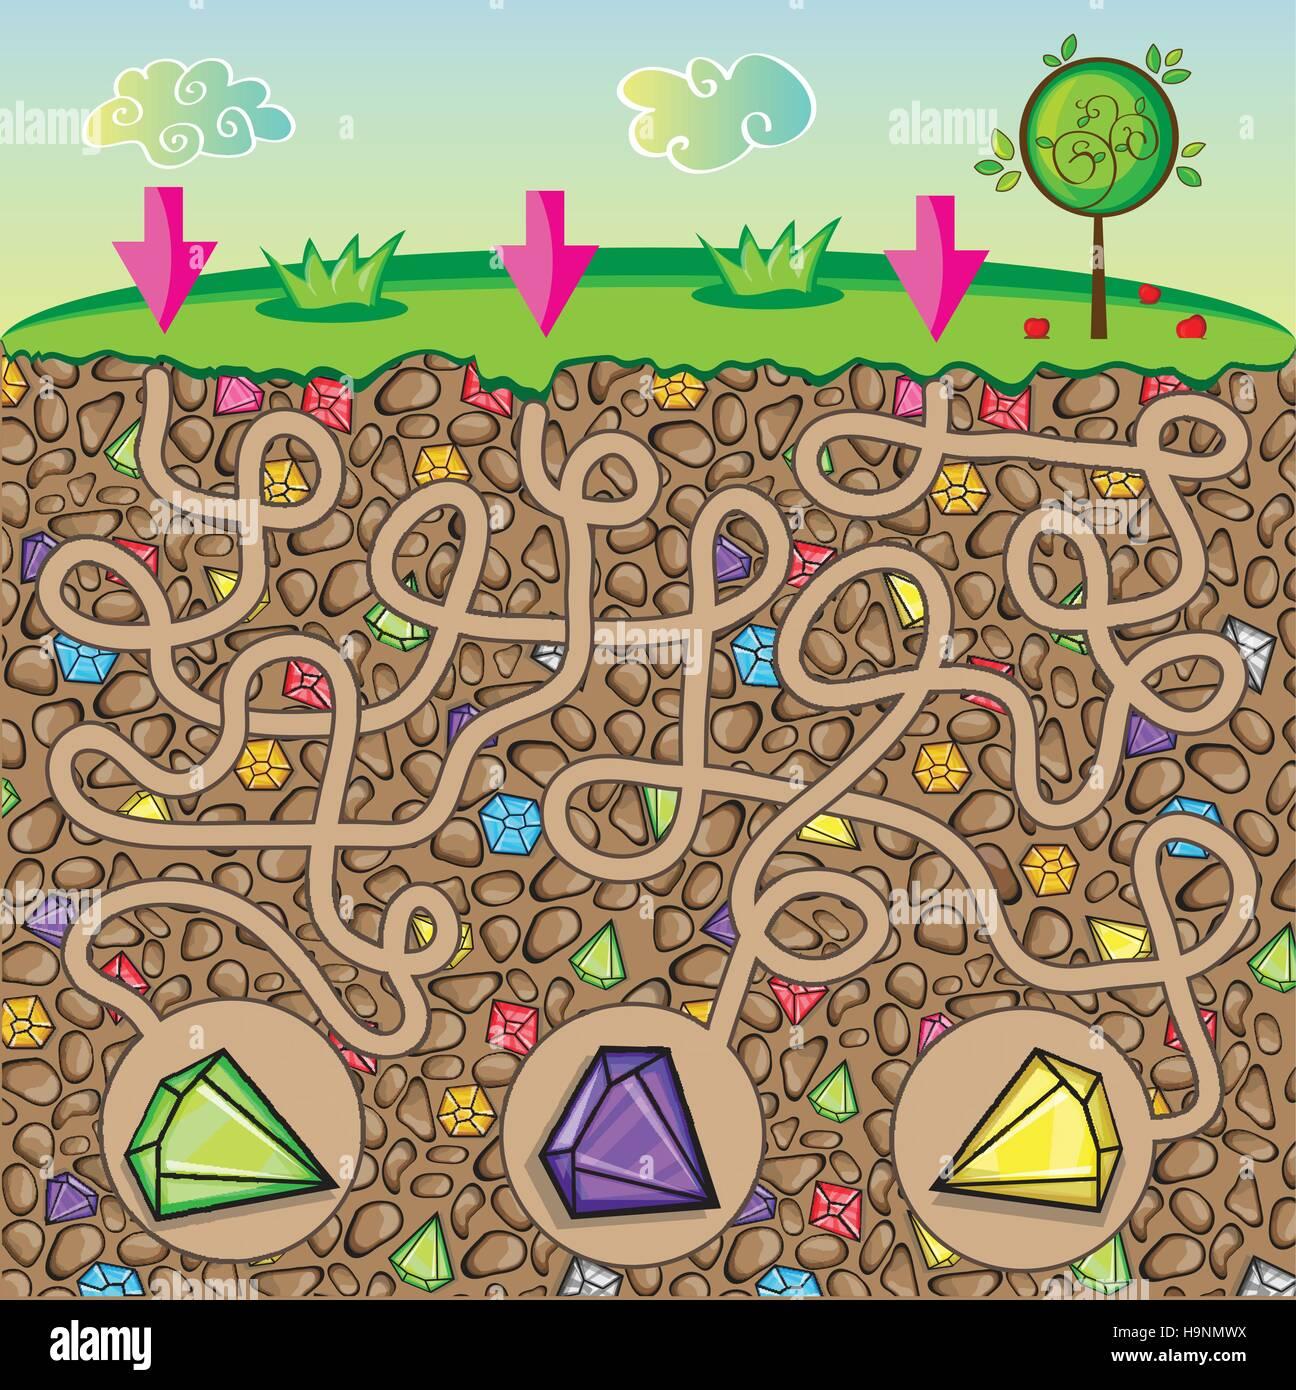 Alien Preschool Maze Worksheet